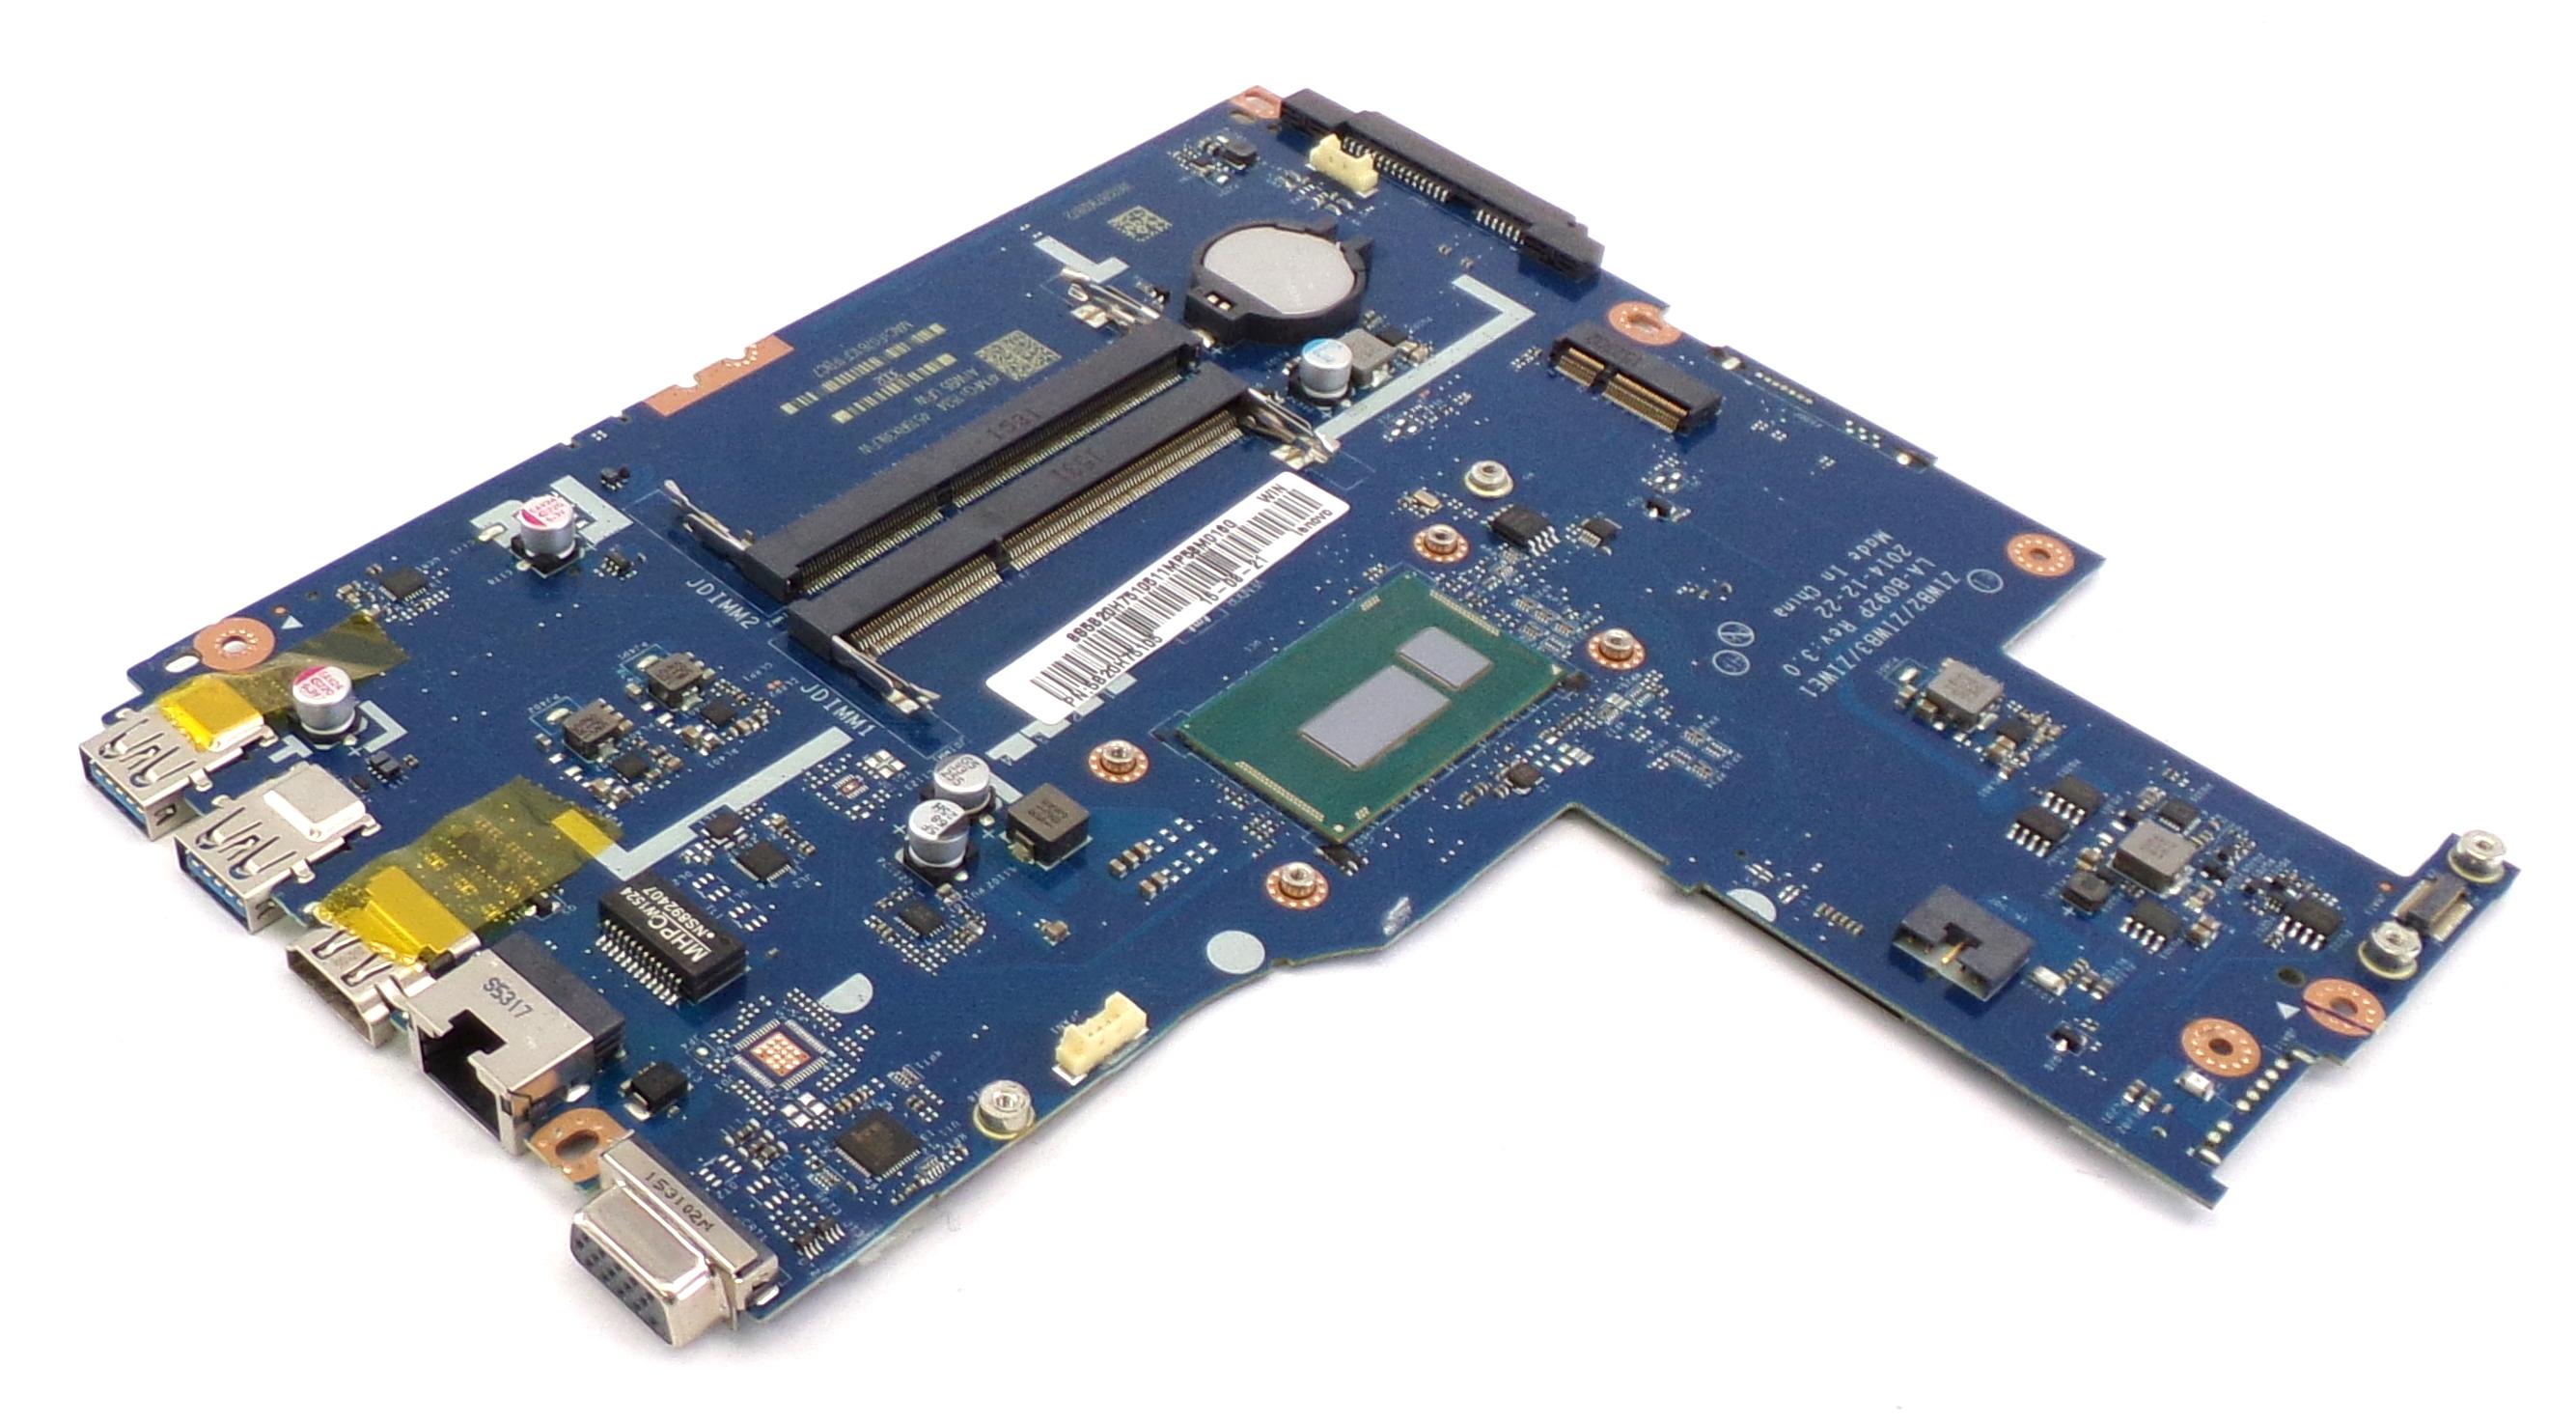 5B20H75105 Lenovo B50-80 with Intel Core i3-4005U Laptop Motherboard